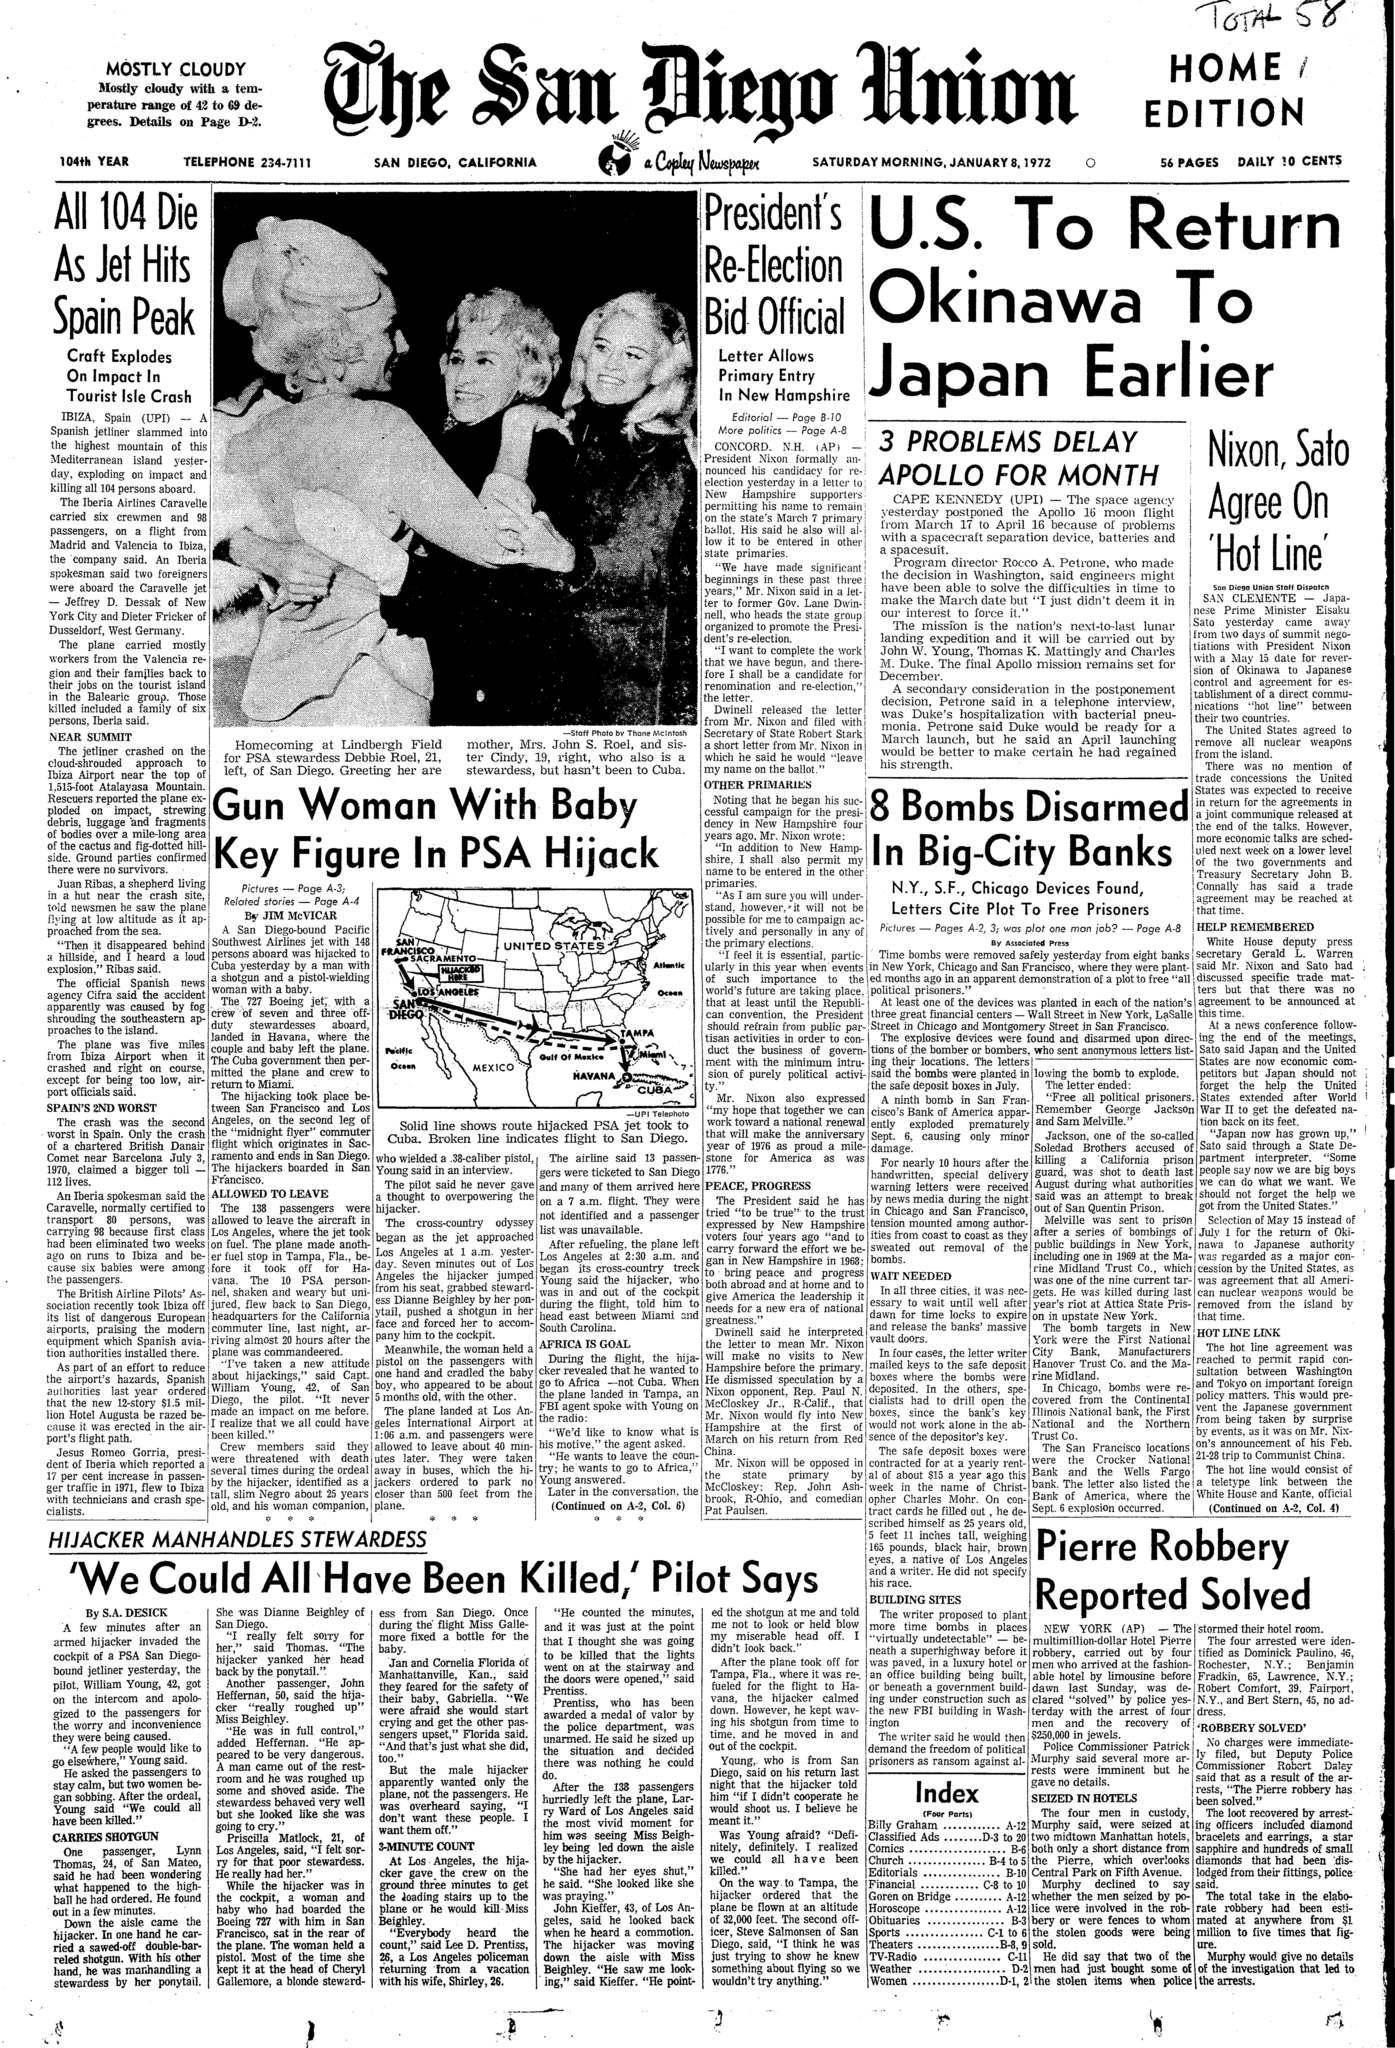 January 8, 1972